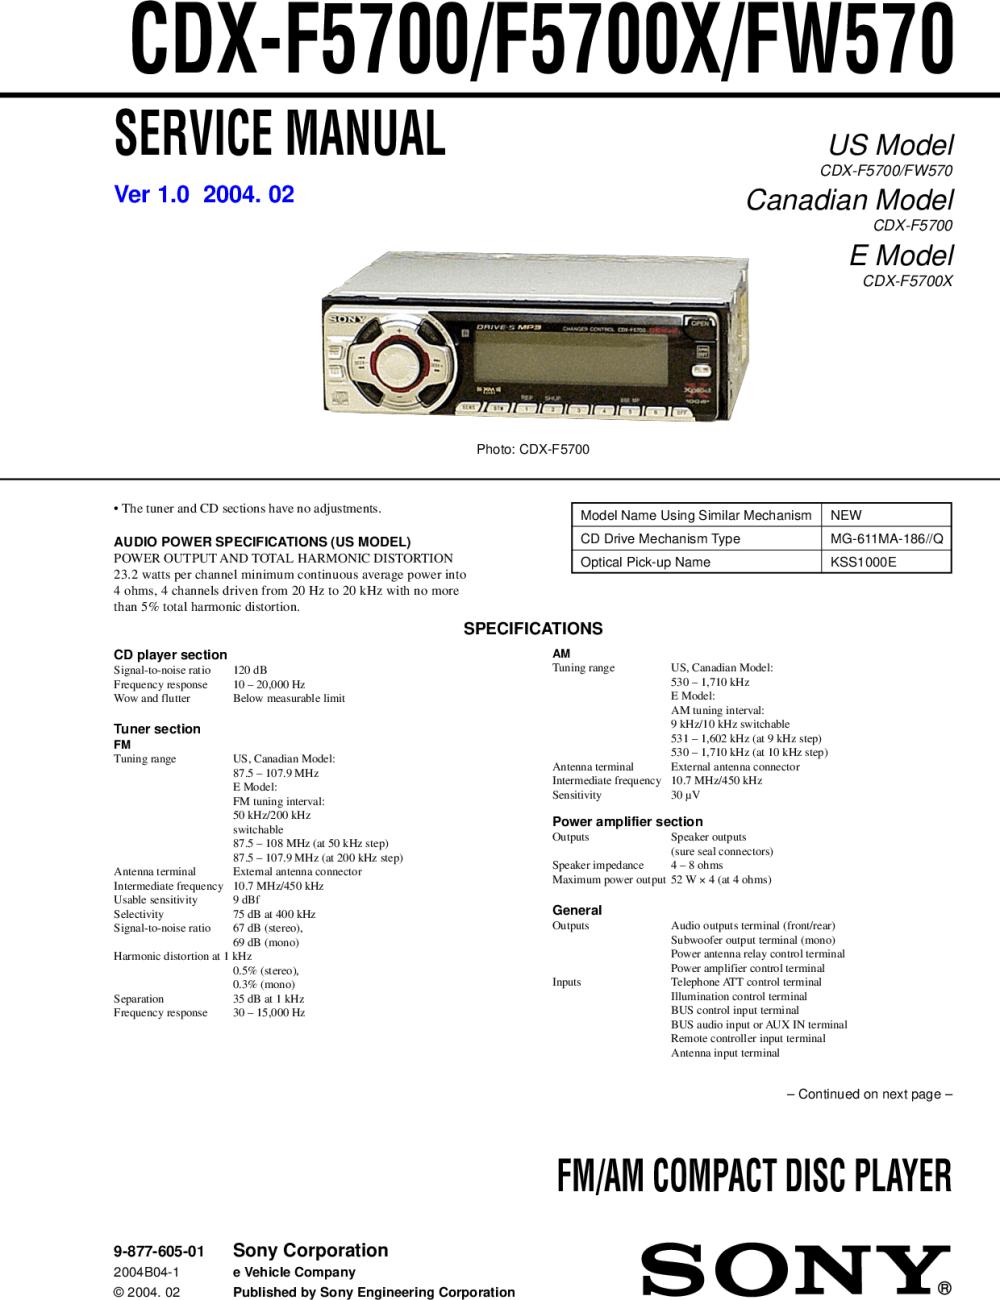 medium resolution of sony cdx fw570 wiring diagram